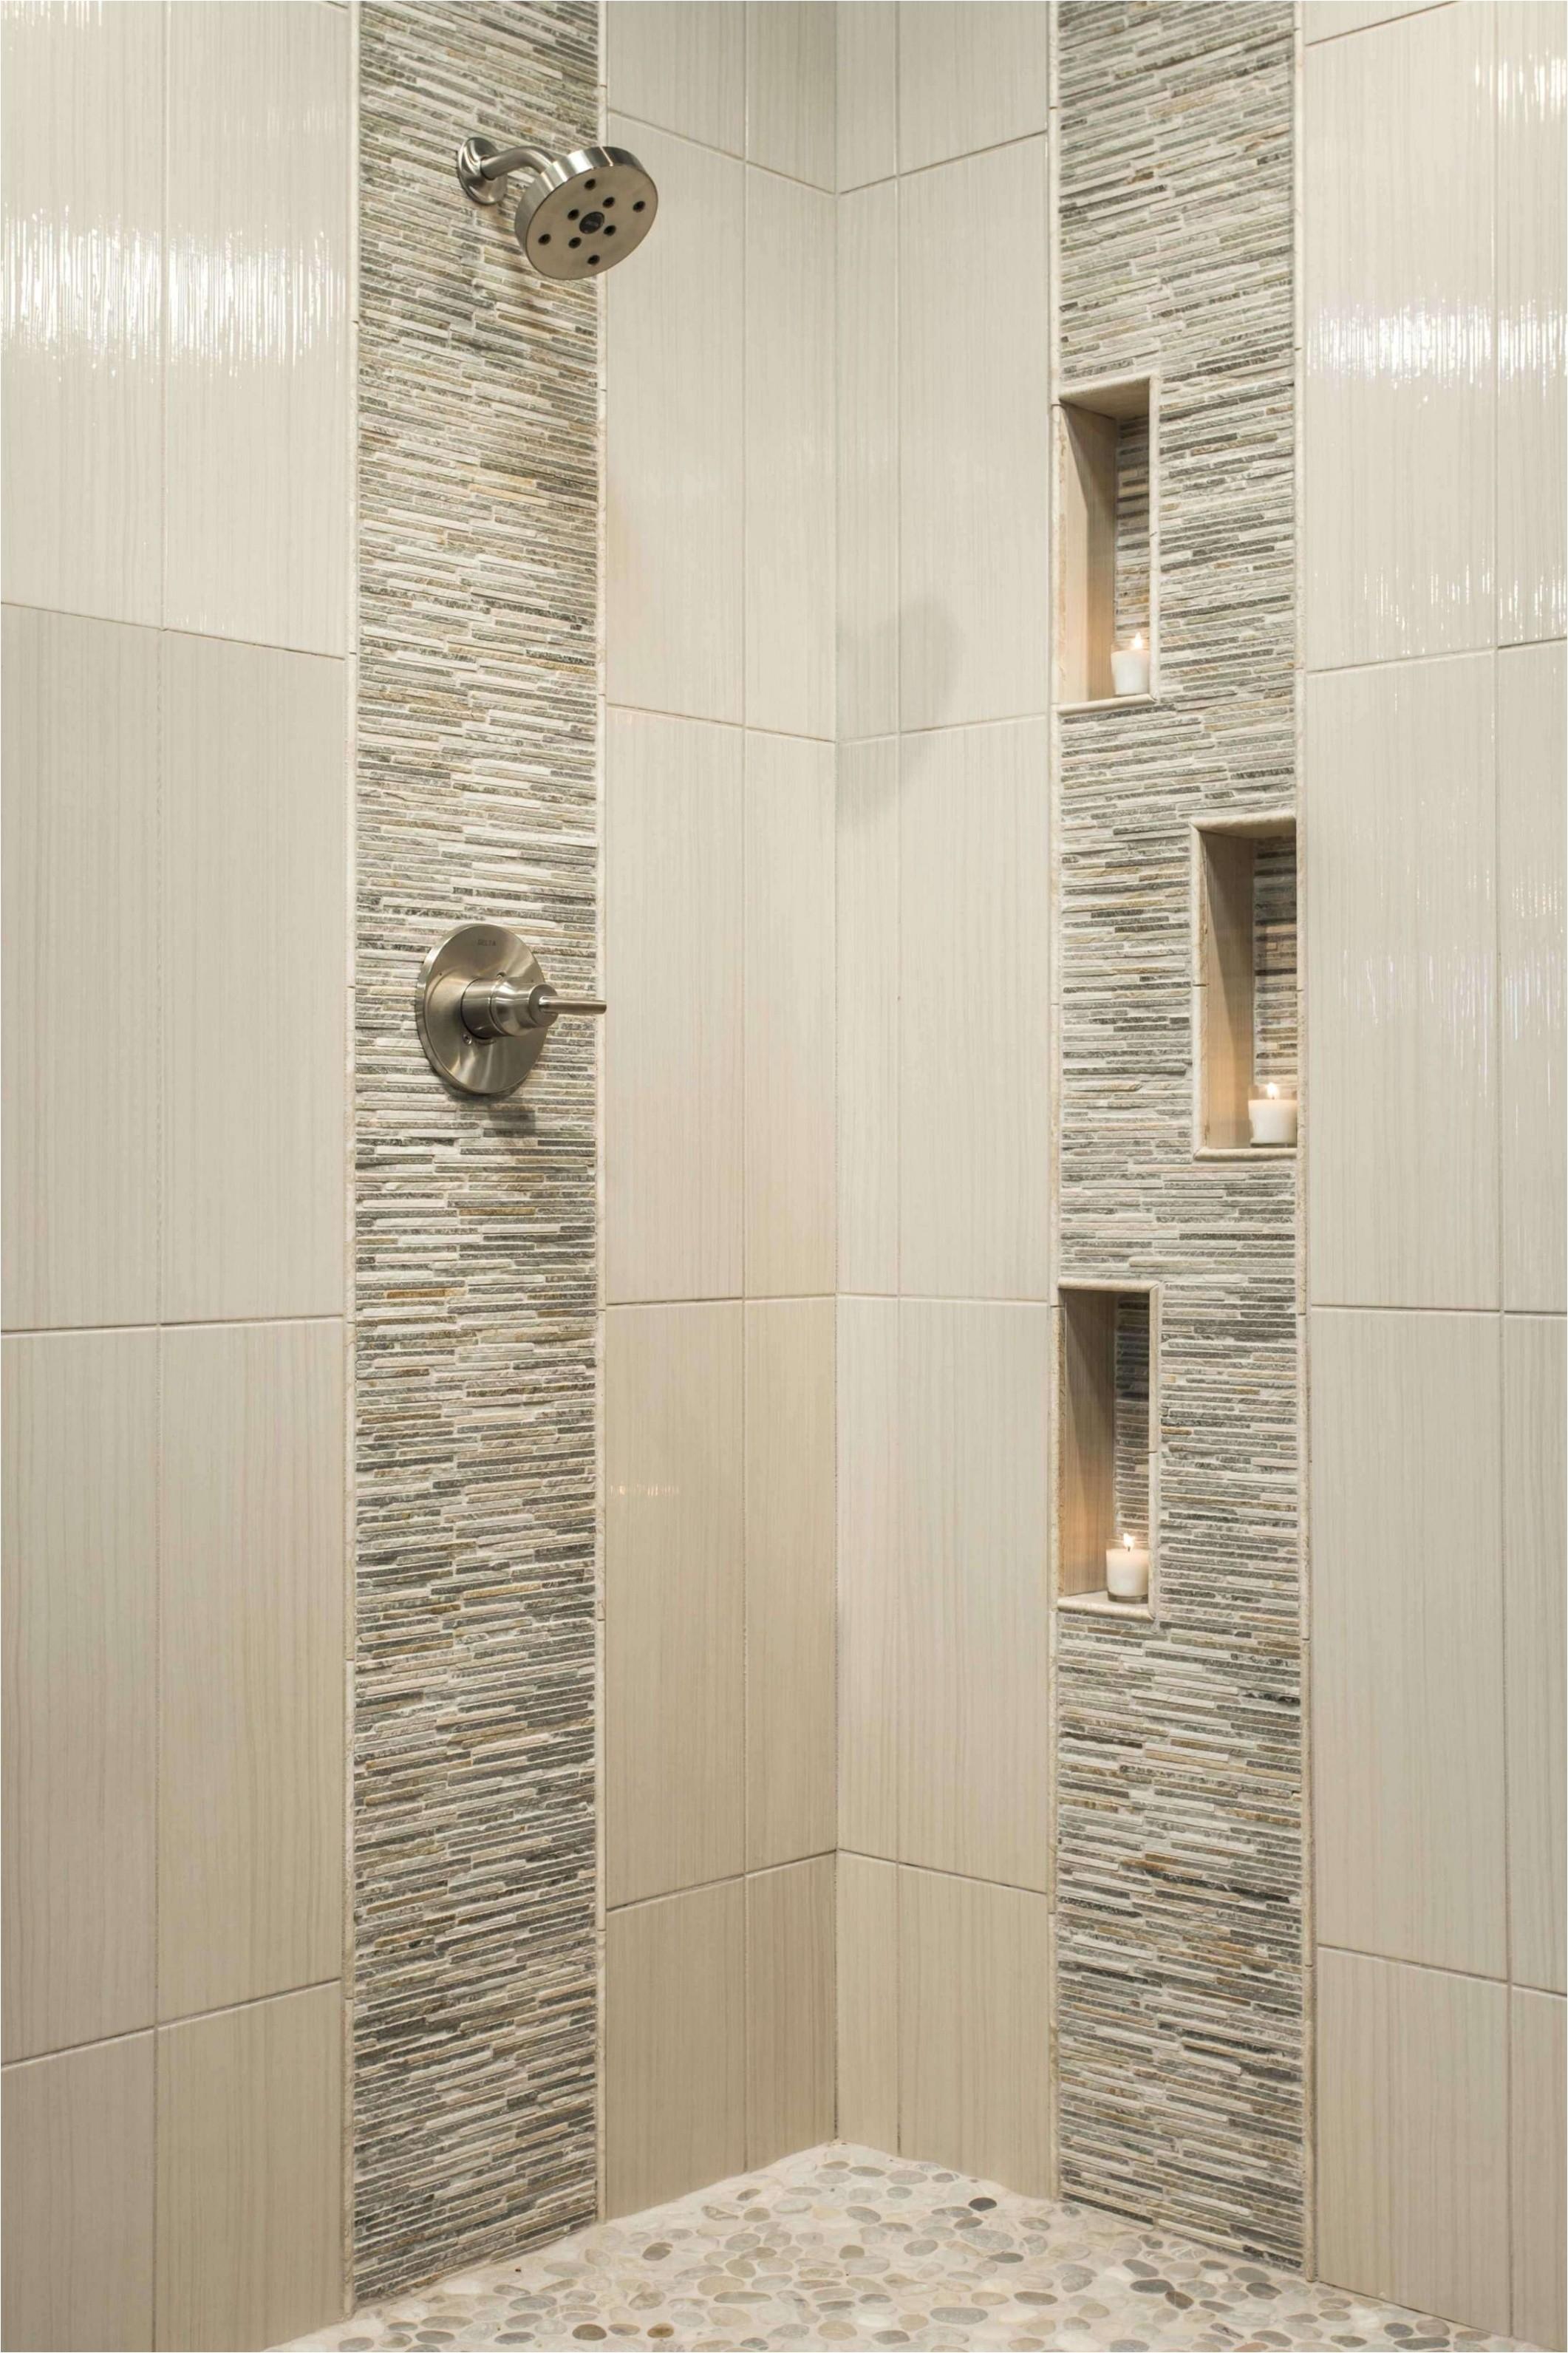 Bathroom Flooring Tile Ideas New Bathroom Floor Tiles Design Valid Floor Tiles Mosaic Bathroom 0d New